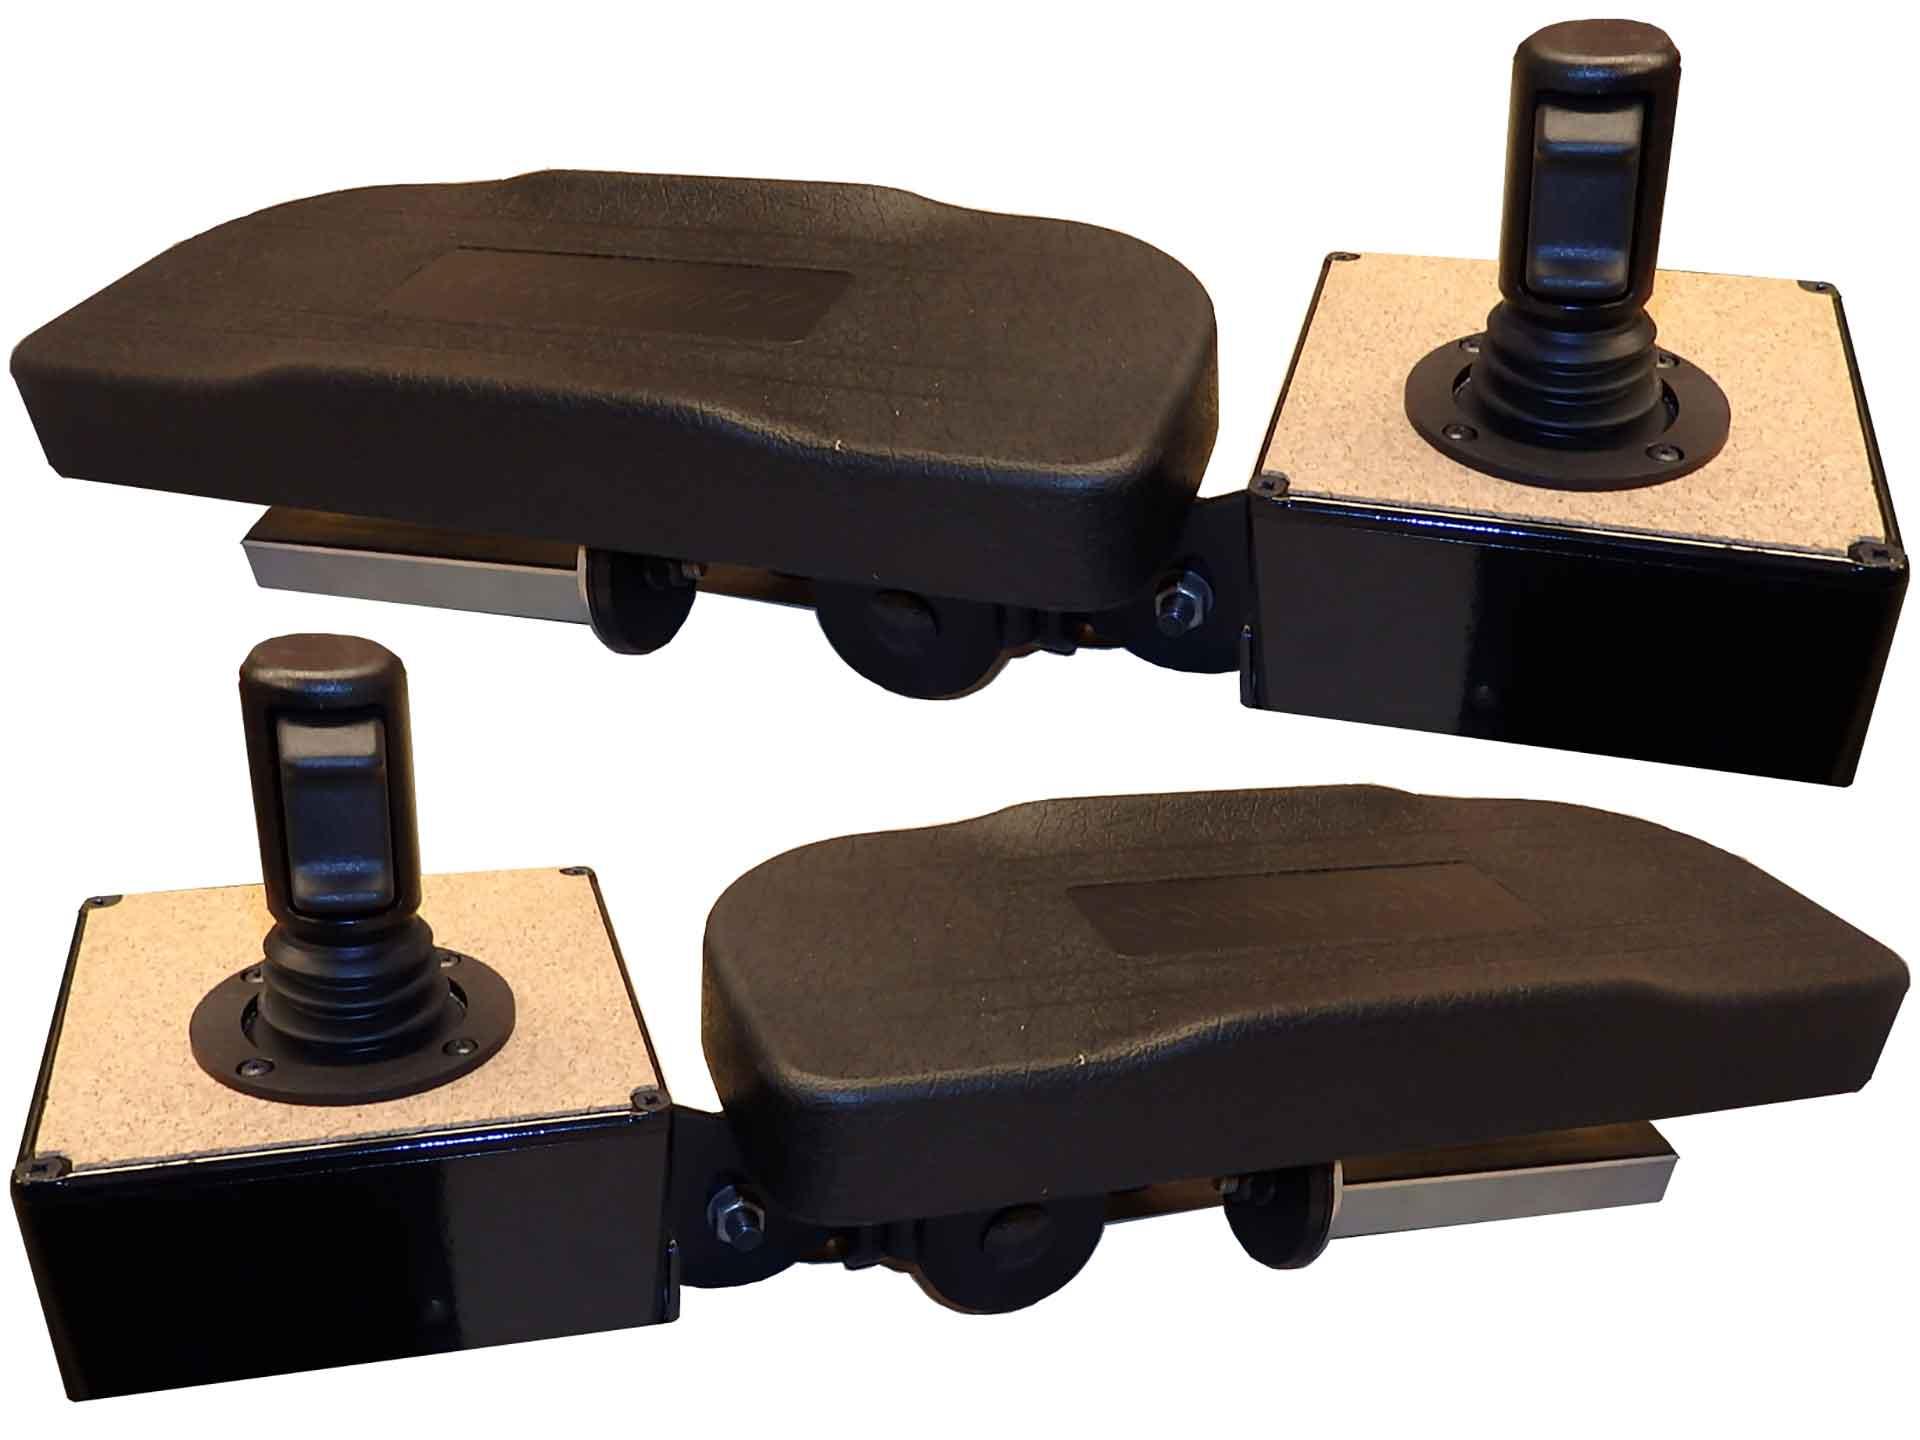 Frameco 2000 armrests & Ottot JHM joysticks